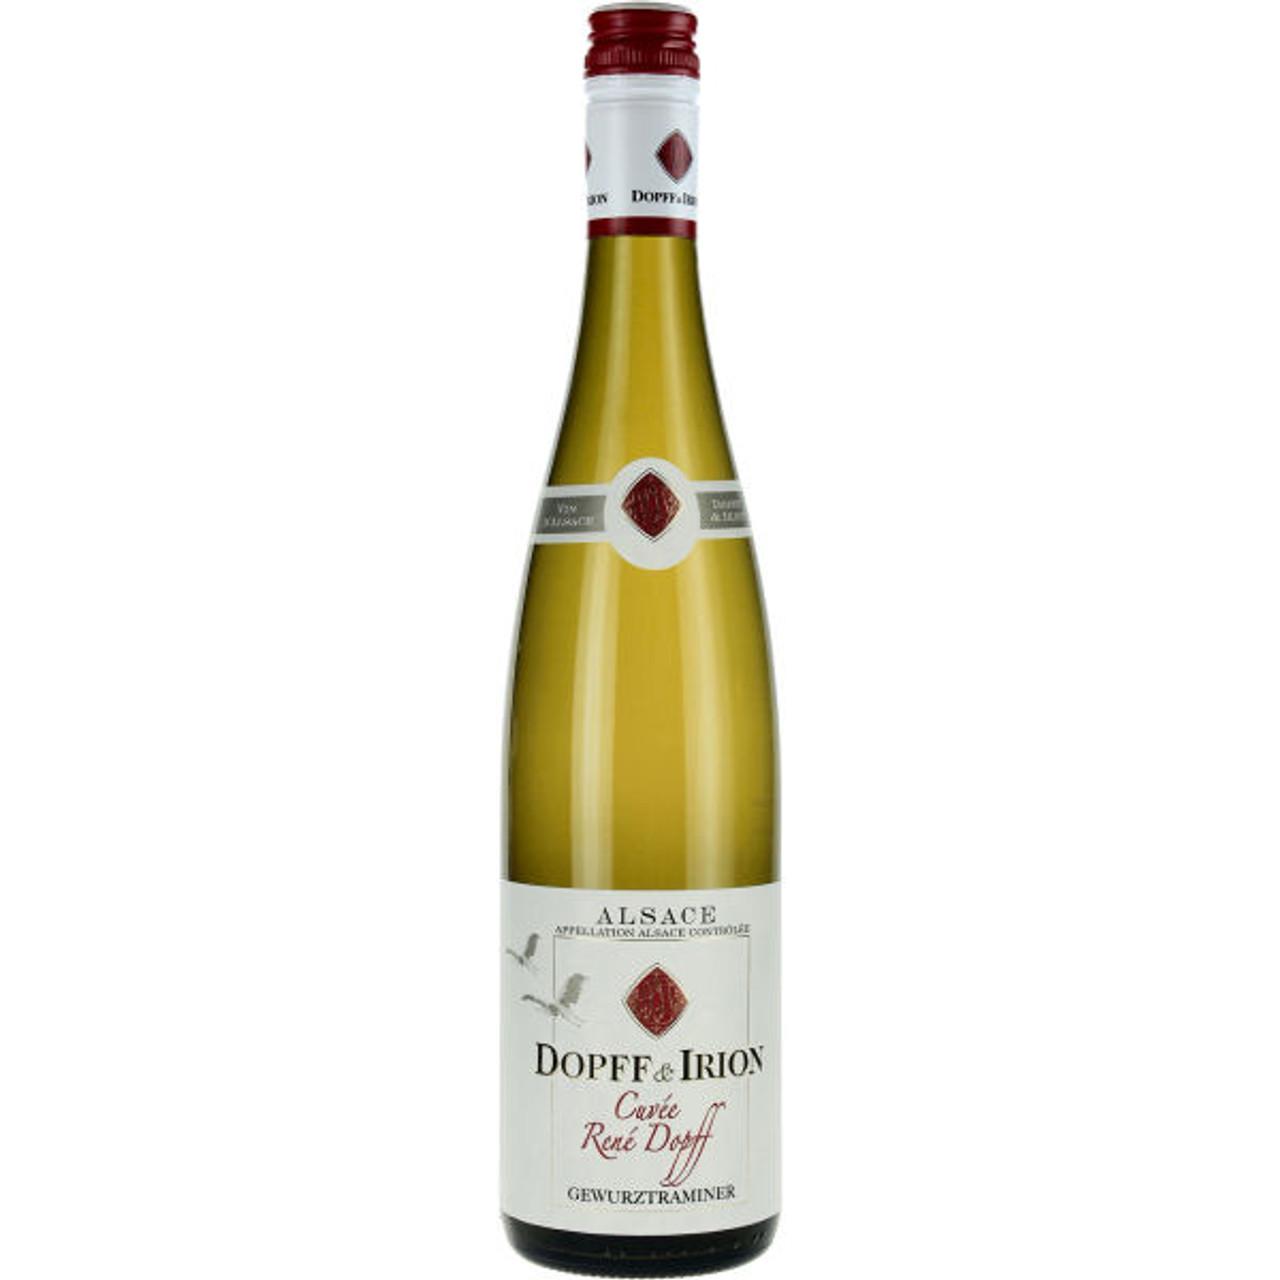 Dopff & Irion Tokay Cuvee Rene Dopff Gewurztraminer Alsace